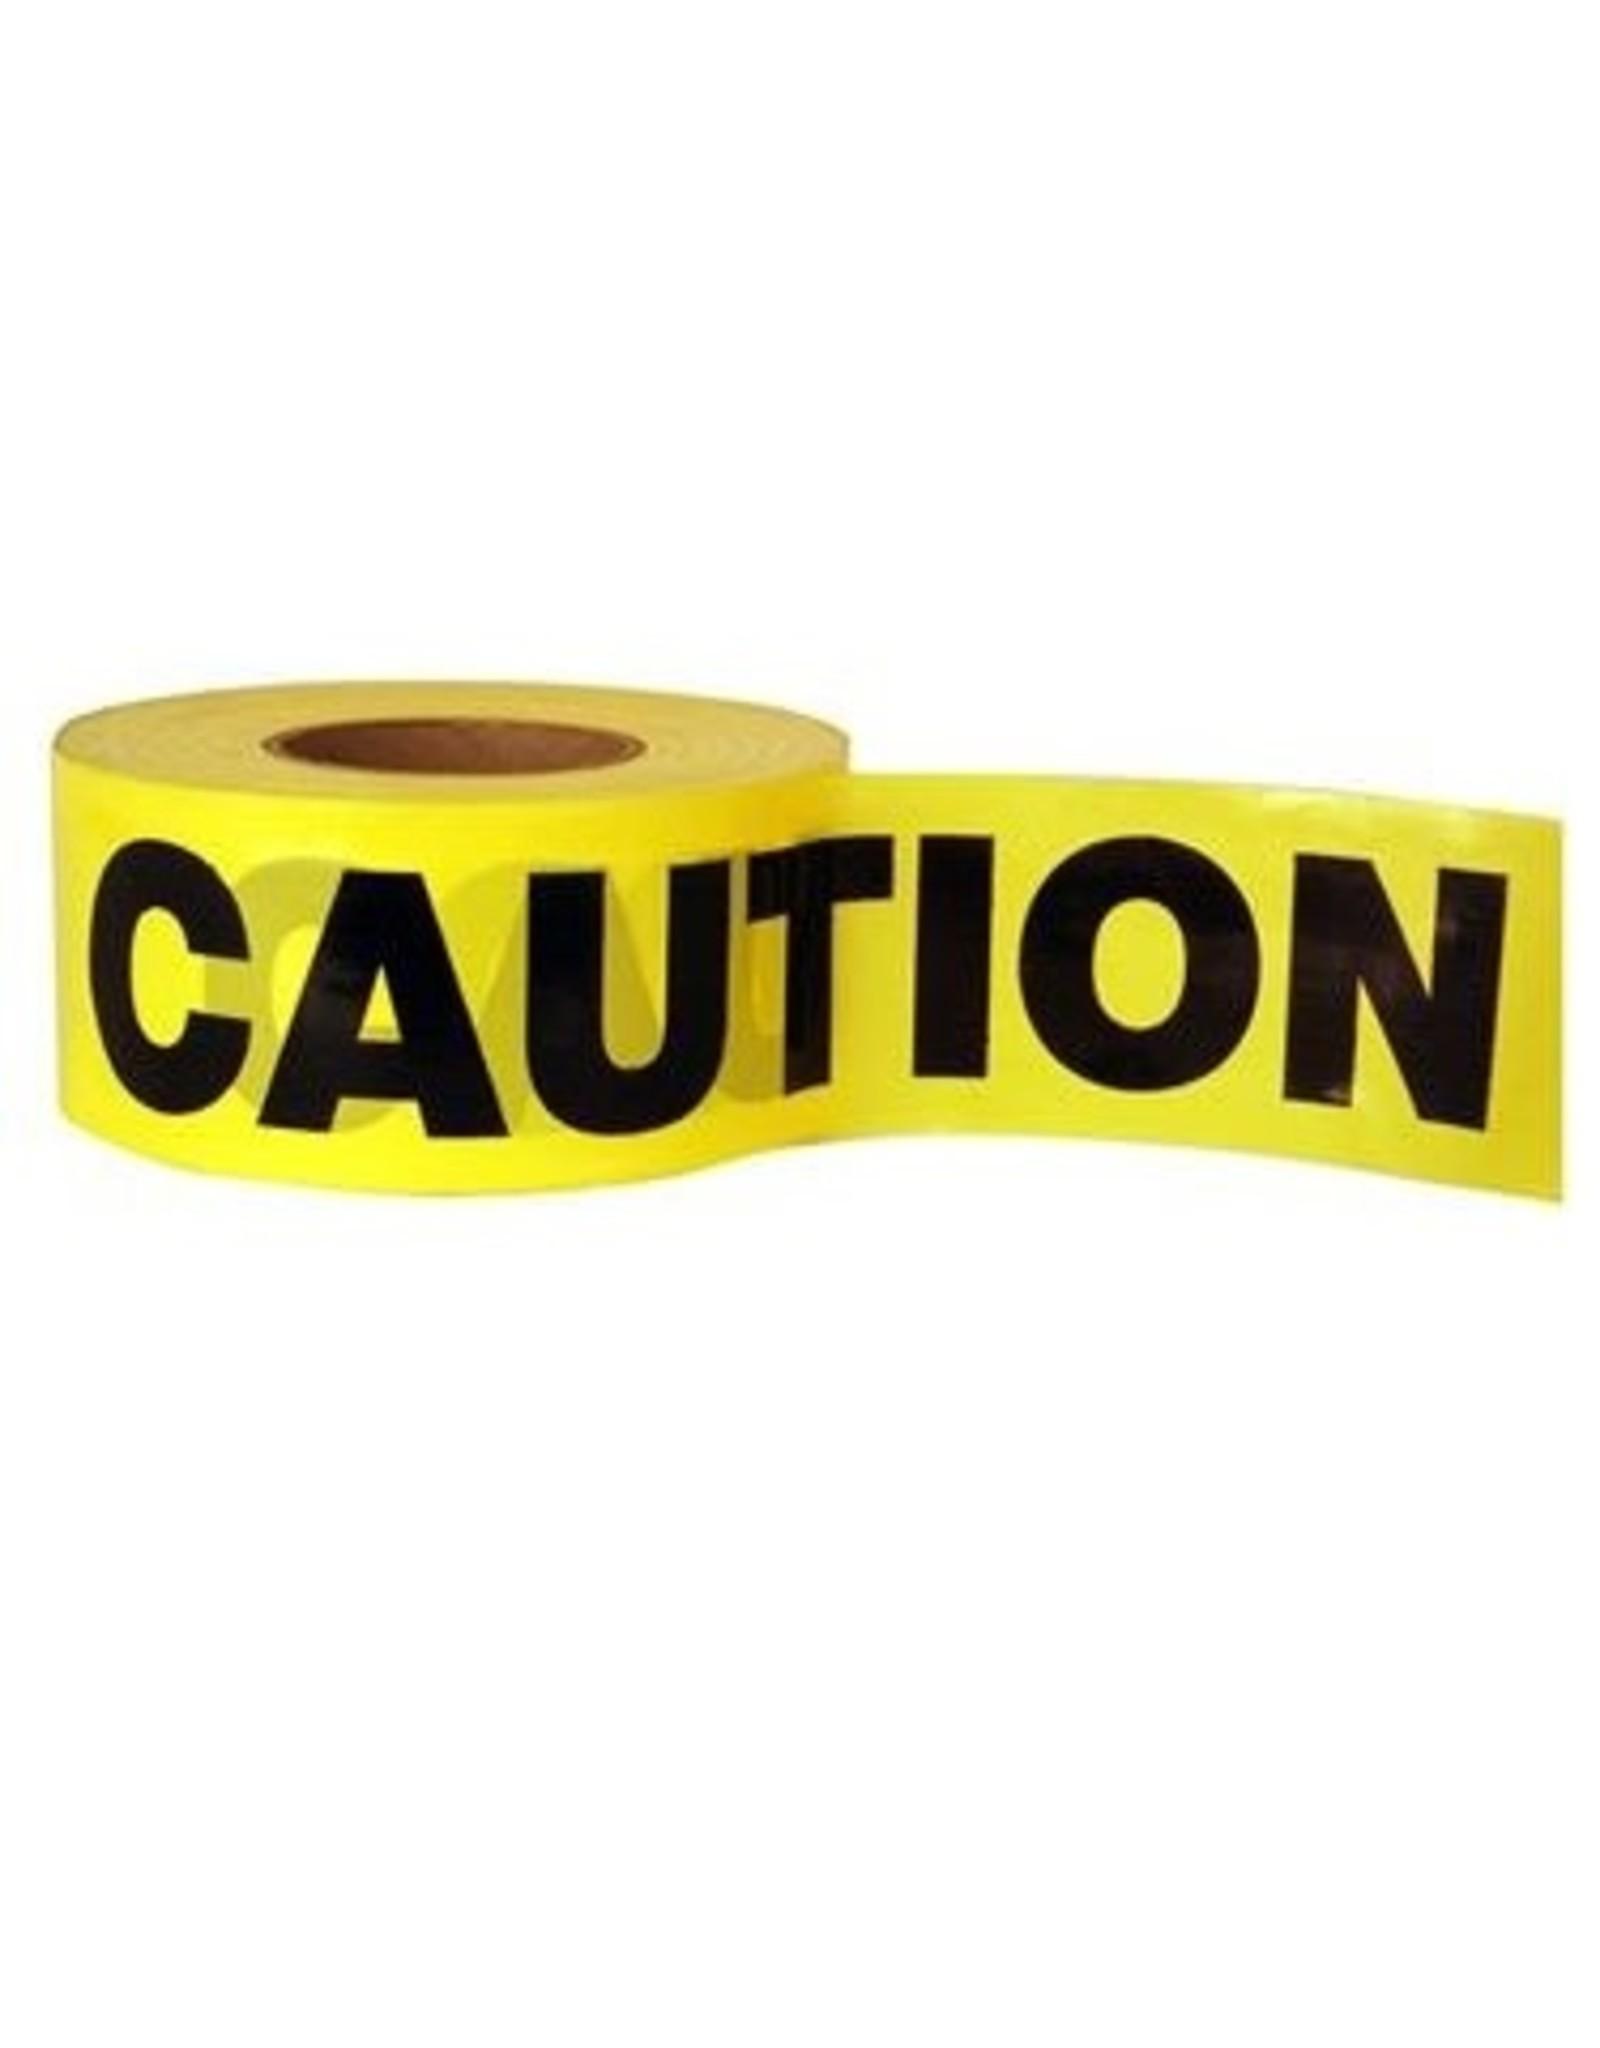 "Cordova Barricade Tape - Caution - 3"" x 1000 ft"